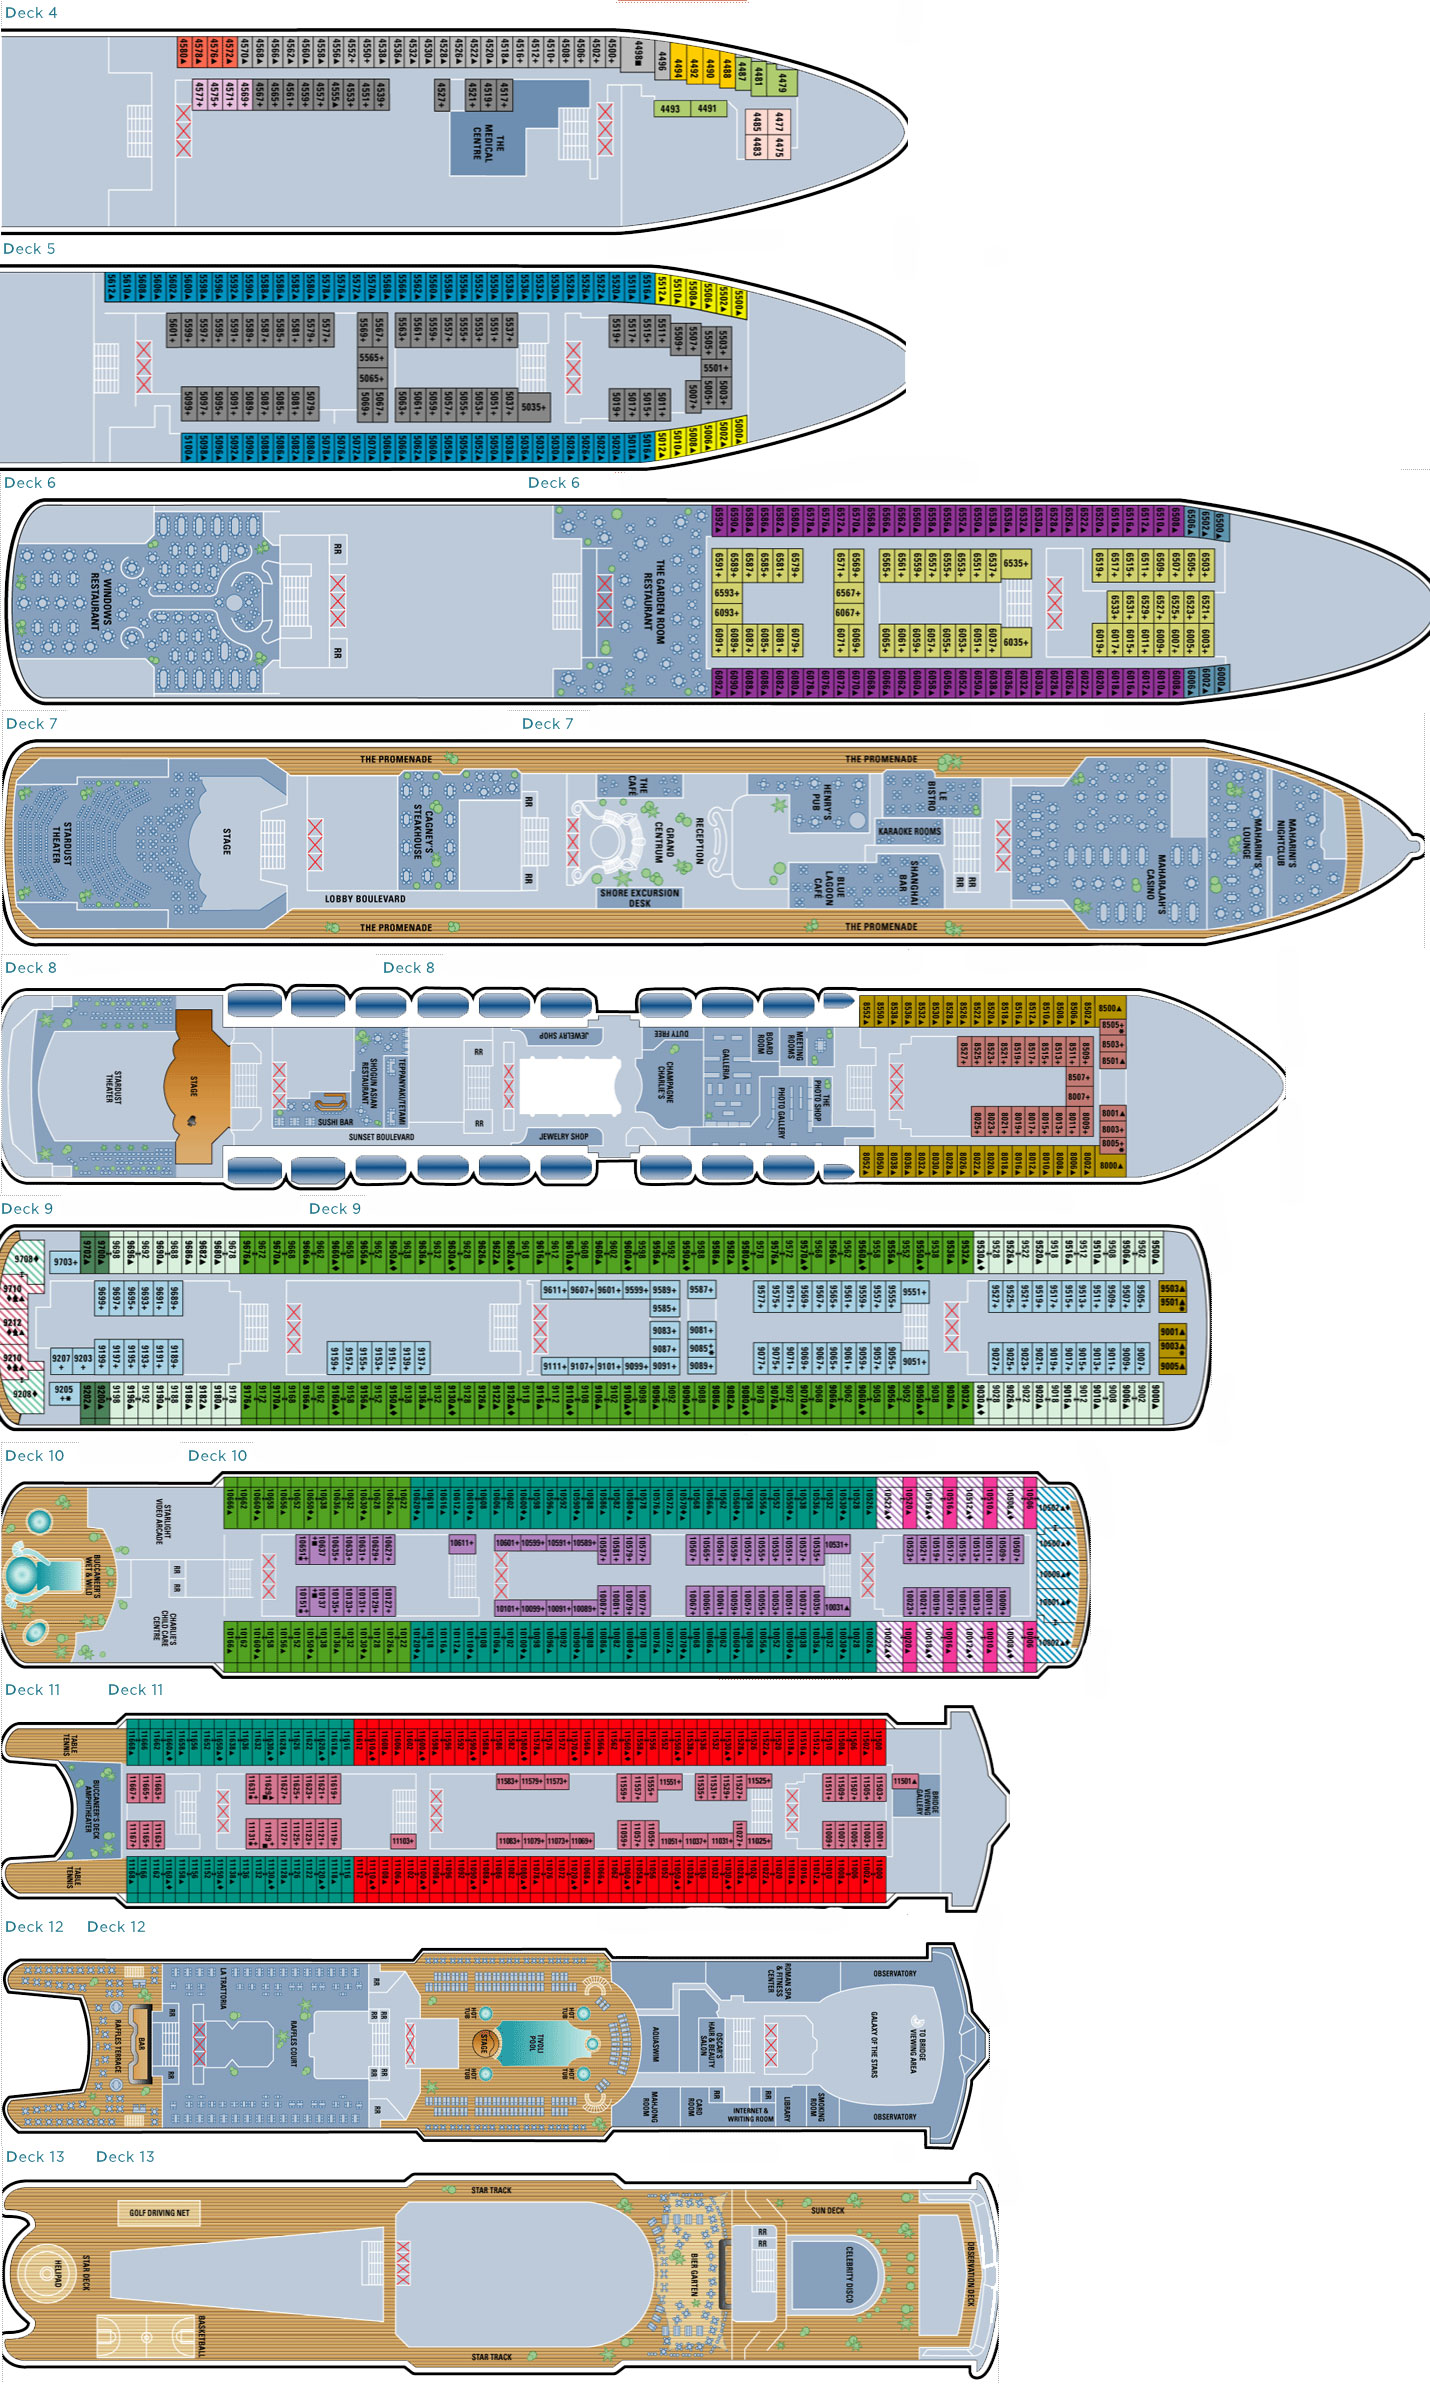 Celebrity silhouette ship deck plans norwegian epic deckplan friv 5 download baanklon Choice Image